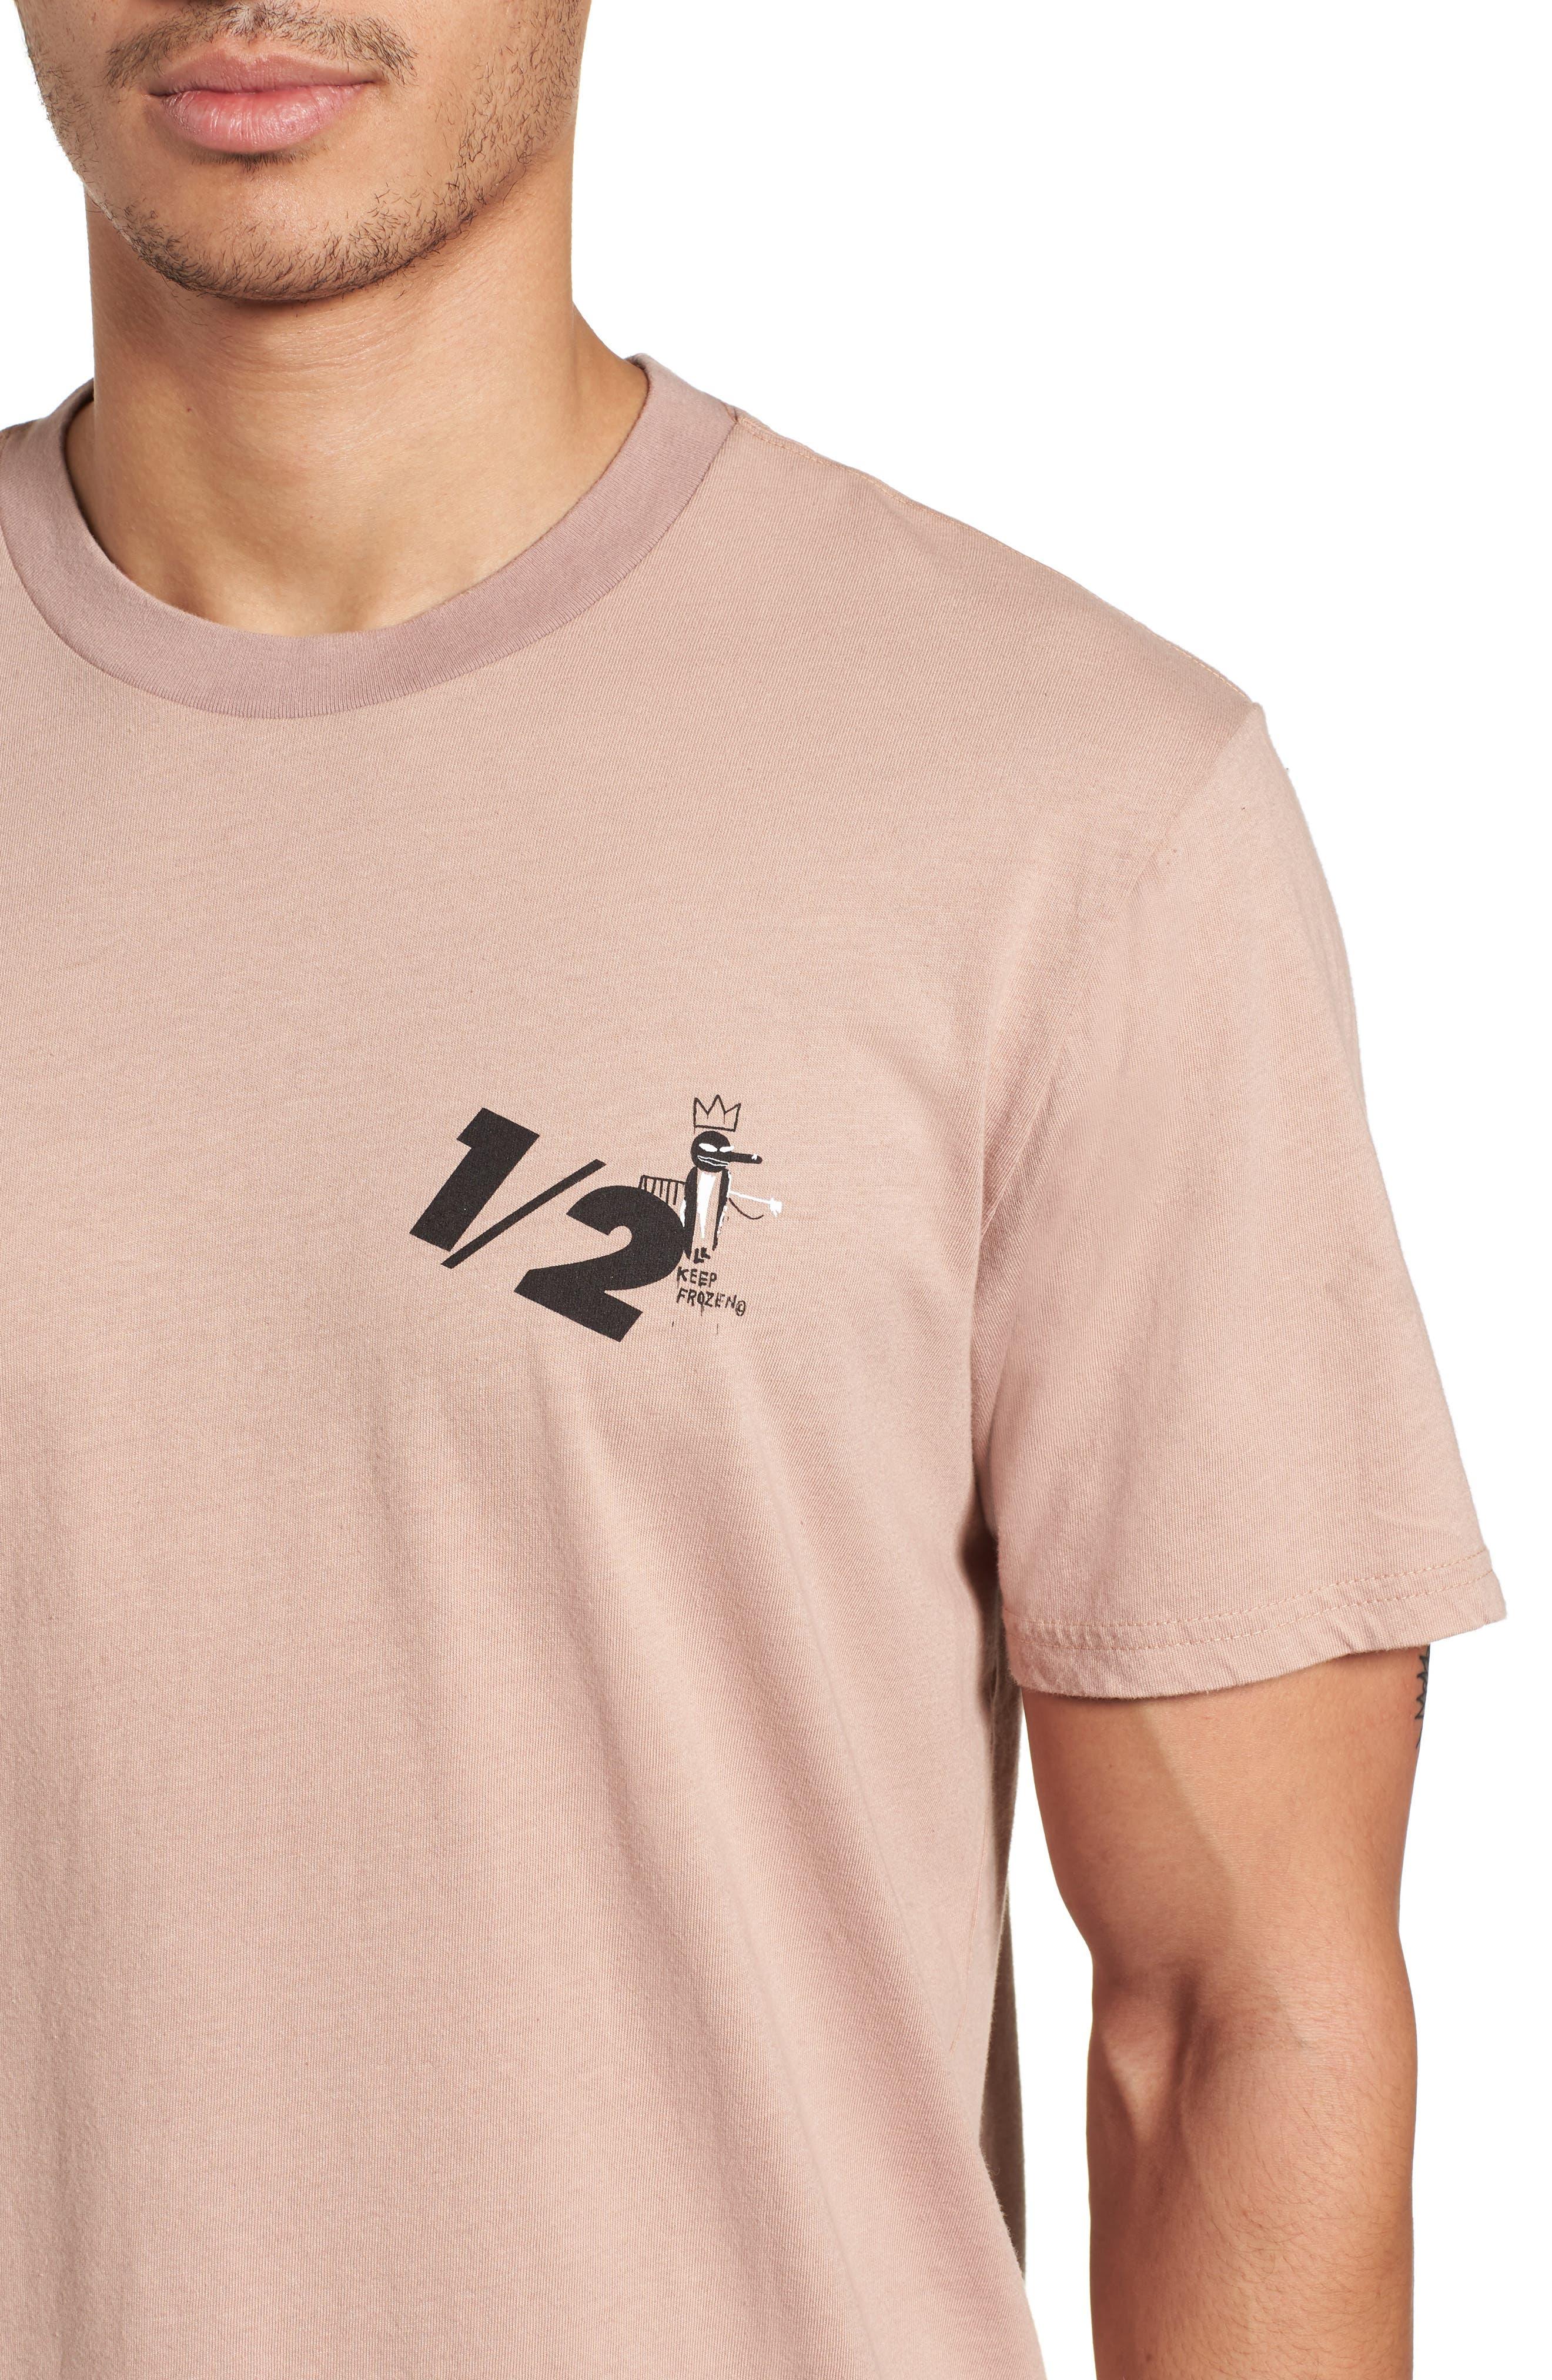 x Warhol Half T-Shirt,                             Alternate thumbnail 4, color,                             Ash Rose